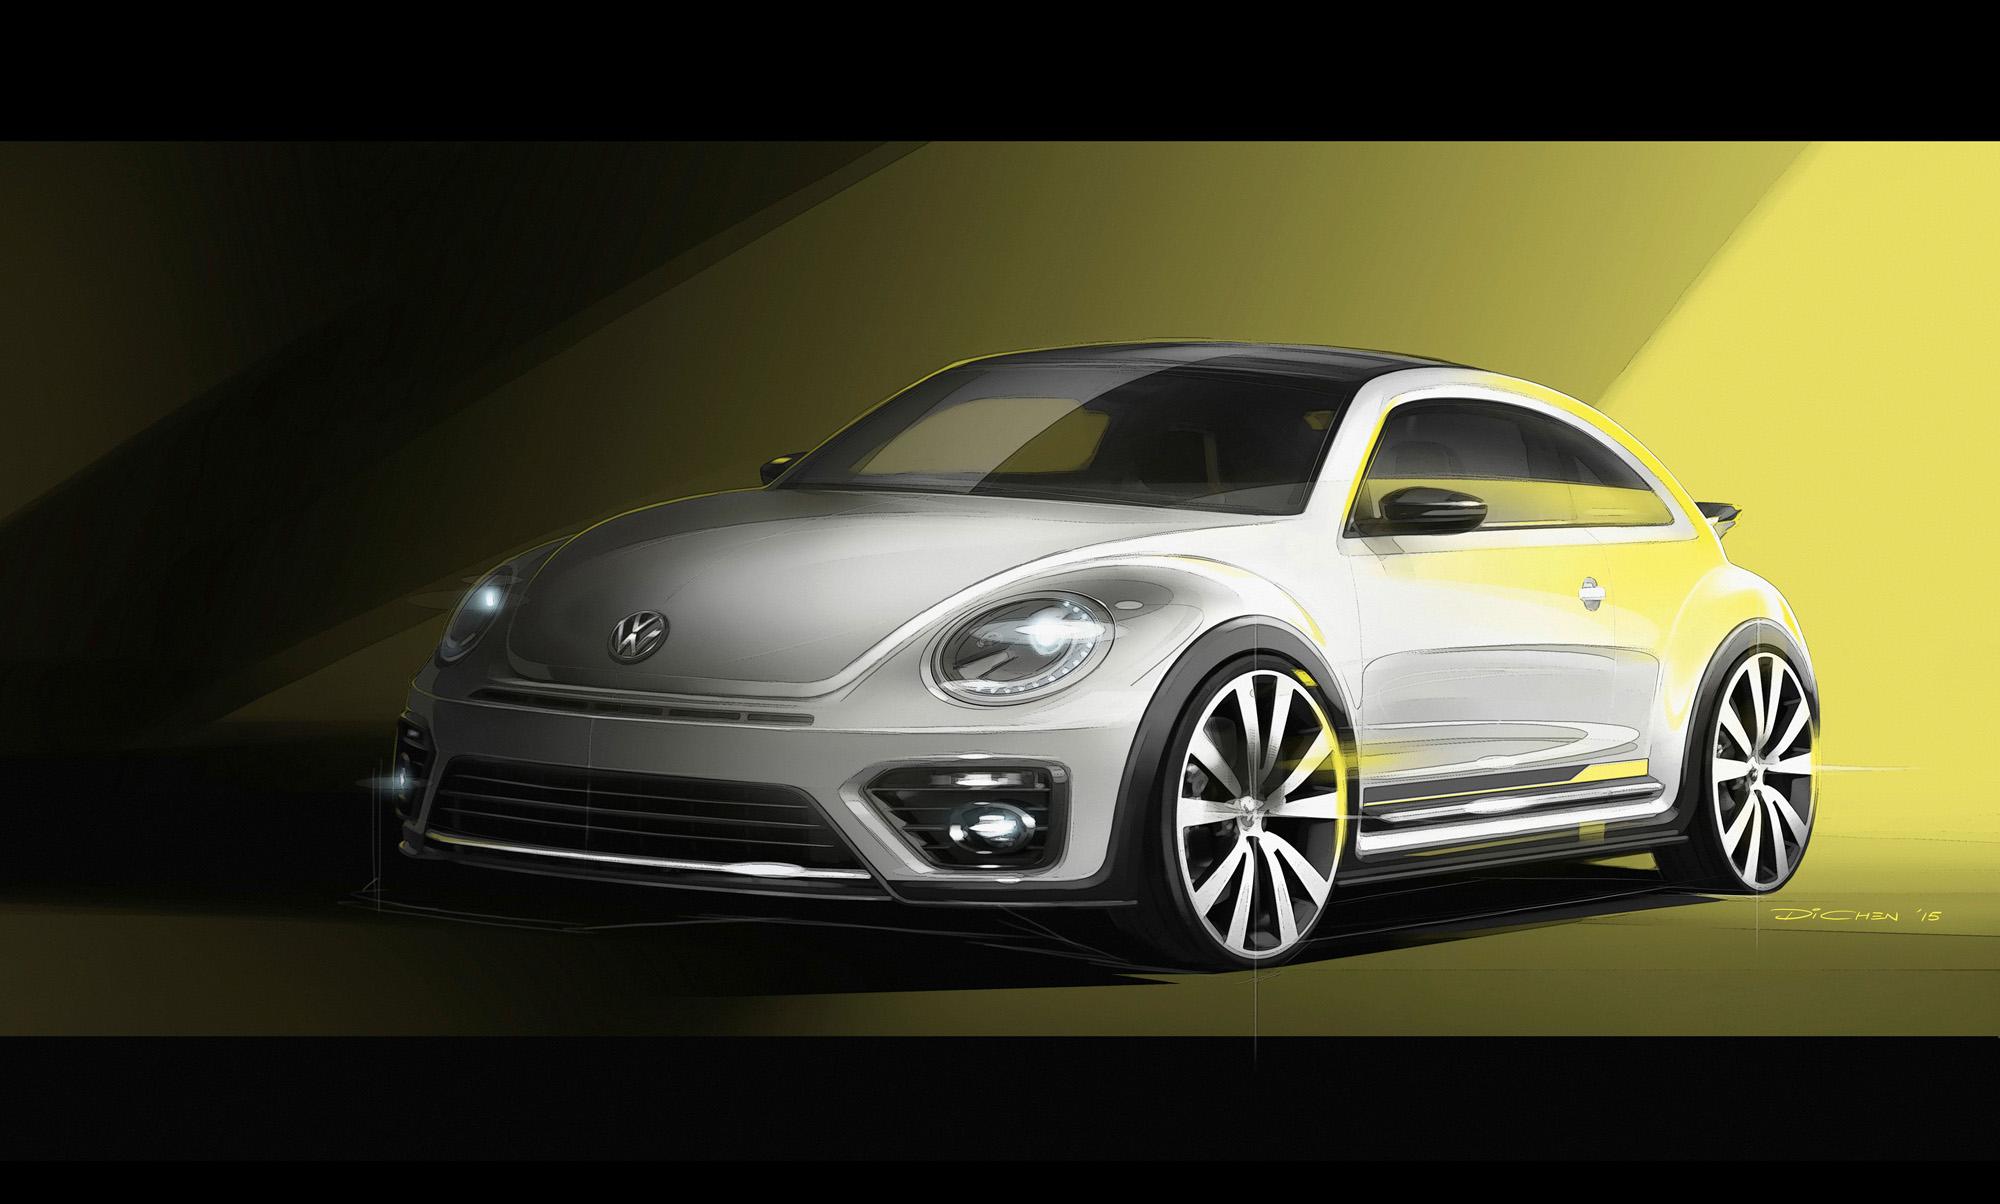 Das VW Beetle Concept R-Line in der Skizze.